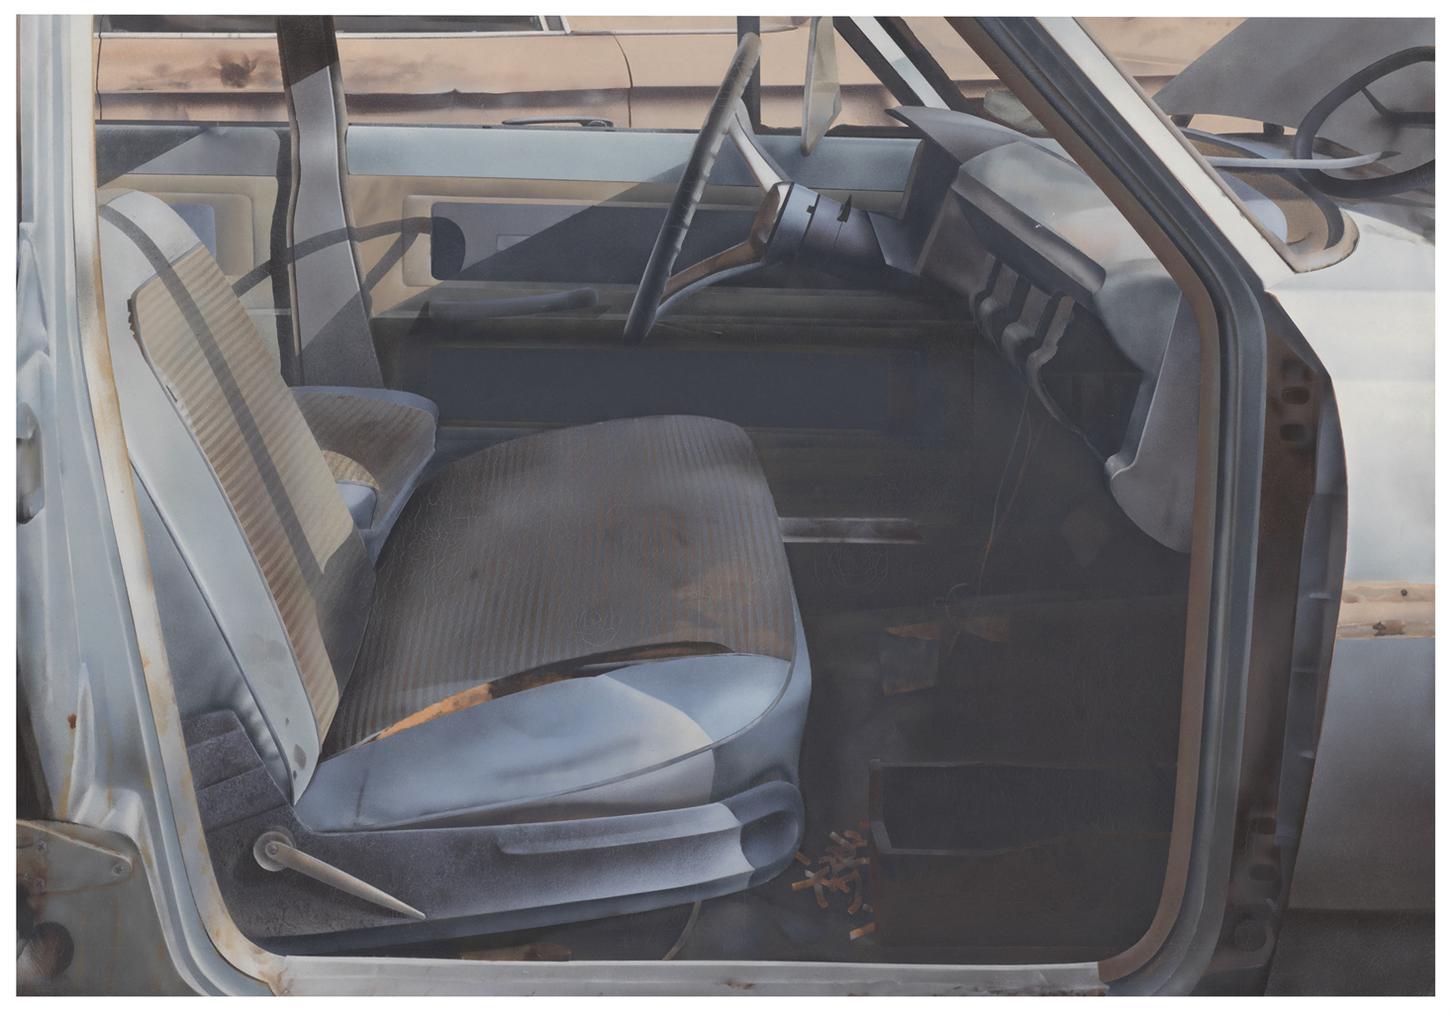 John Salt-Arrested Auto With Blue Seats-1970